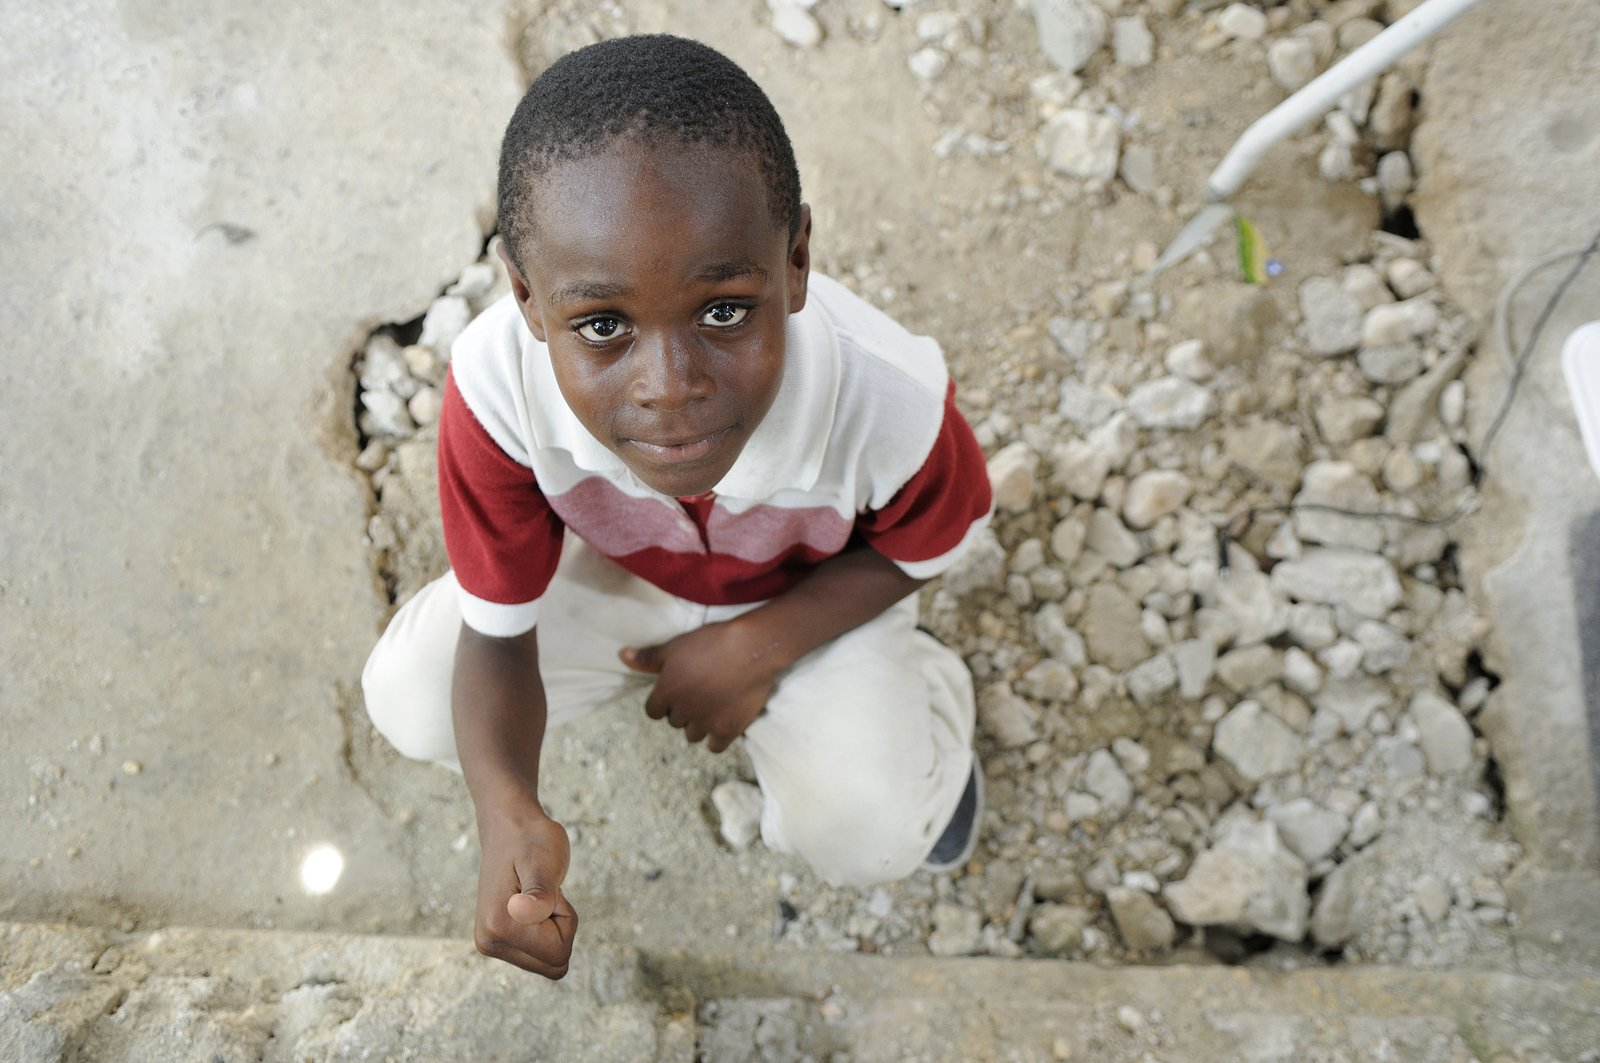 Priority Worldwide Emergency Response Team Rushes Aid to Haiti Post-Earthquake